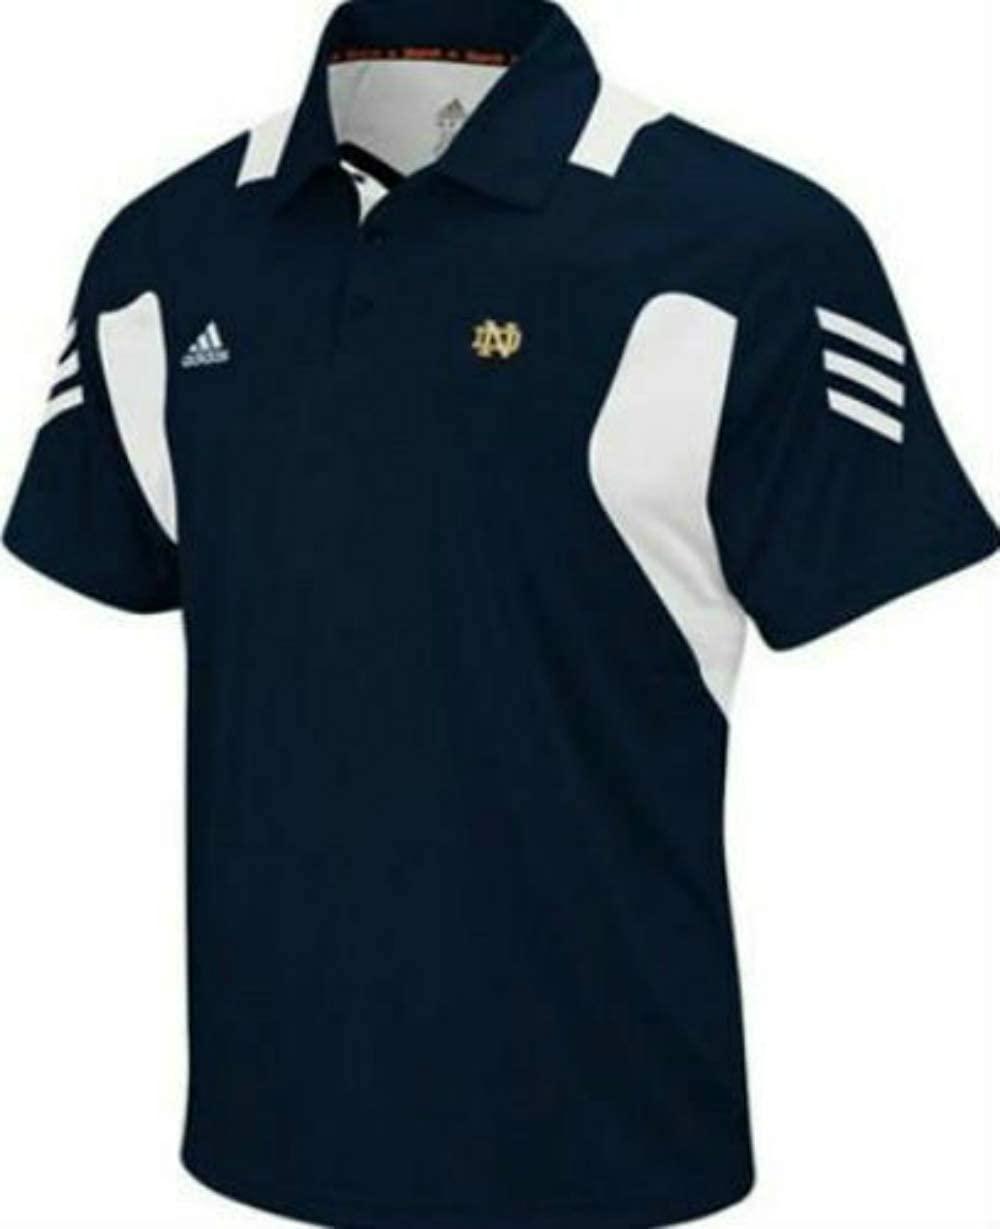 NCAA Team Apparel Notre Dame Fighting Irish Men's Size Medium Performance Scorch Polo Shirt Navy Blue